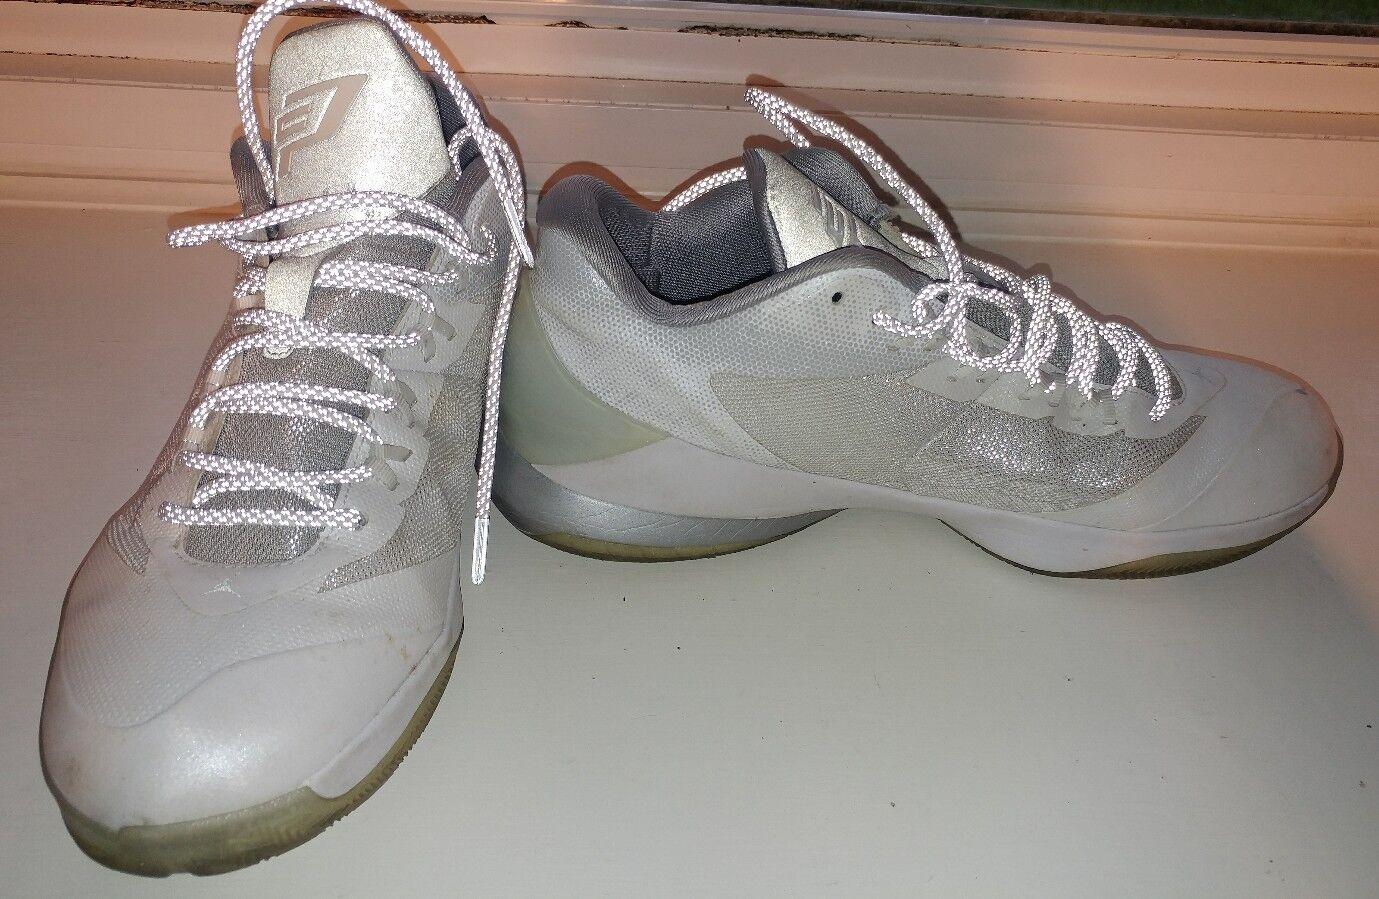 Nike air jordan cp3 viii 8 715852-100 chris paul white di puro platino Uomo 11